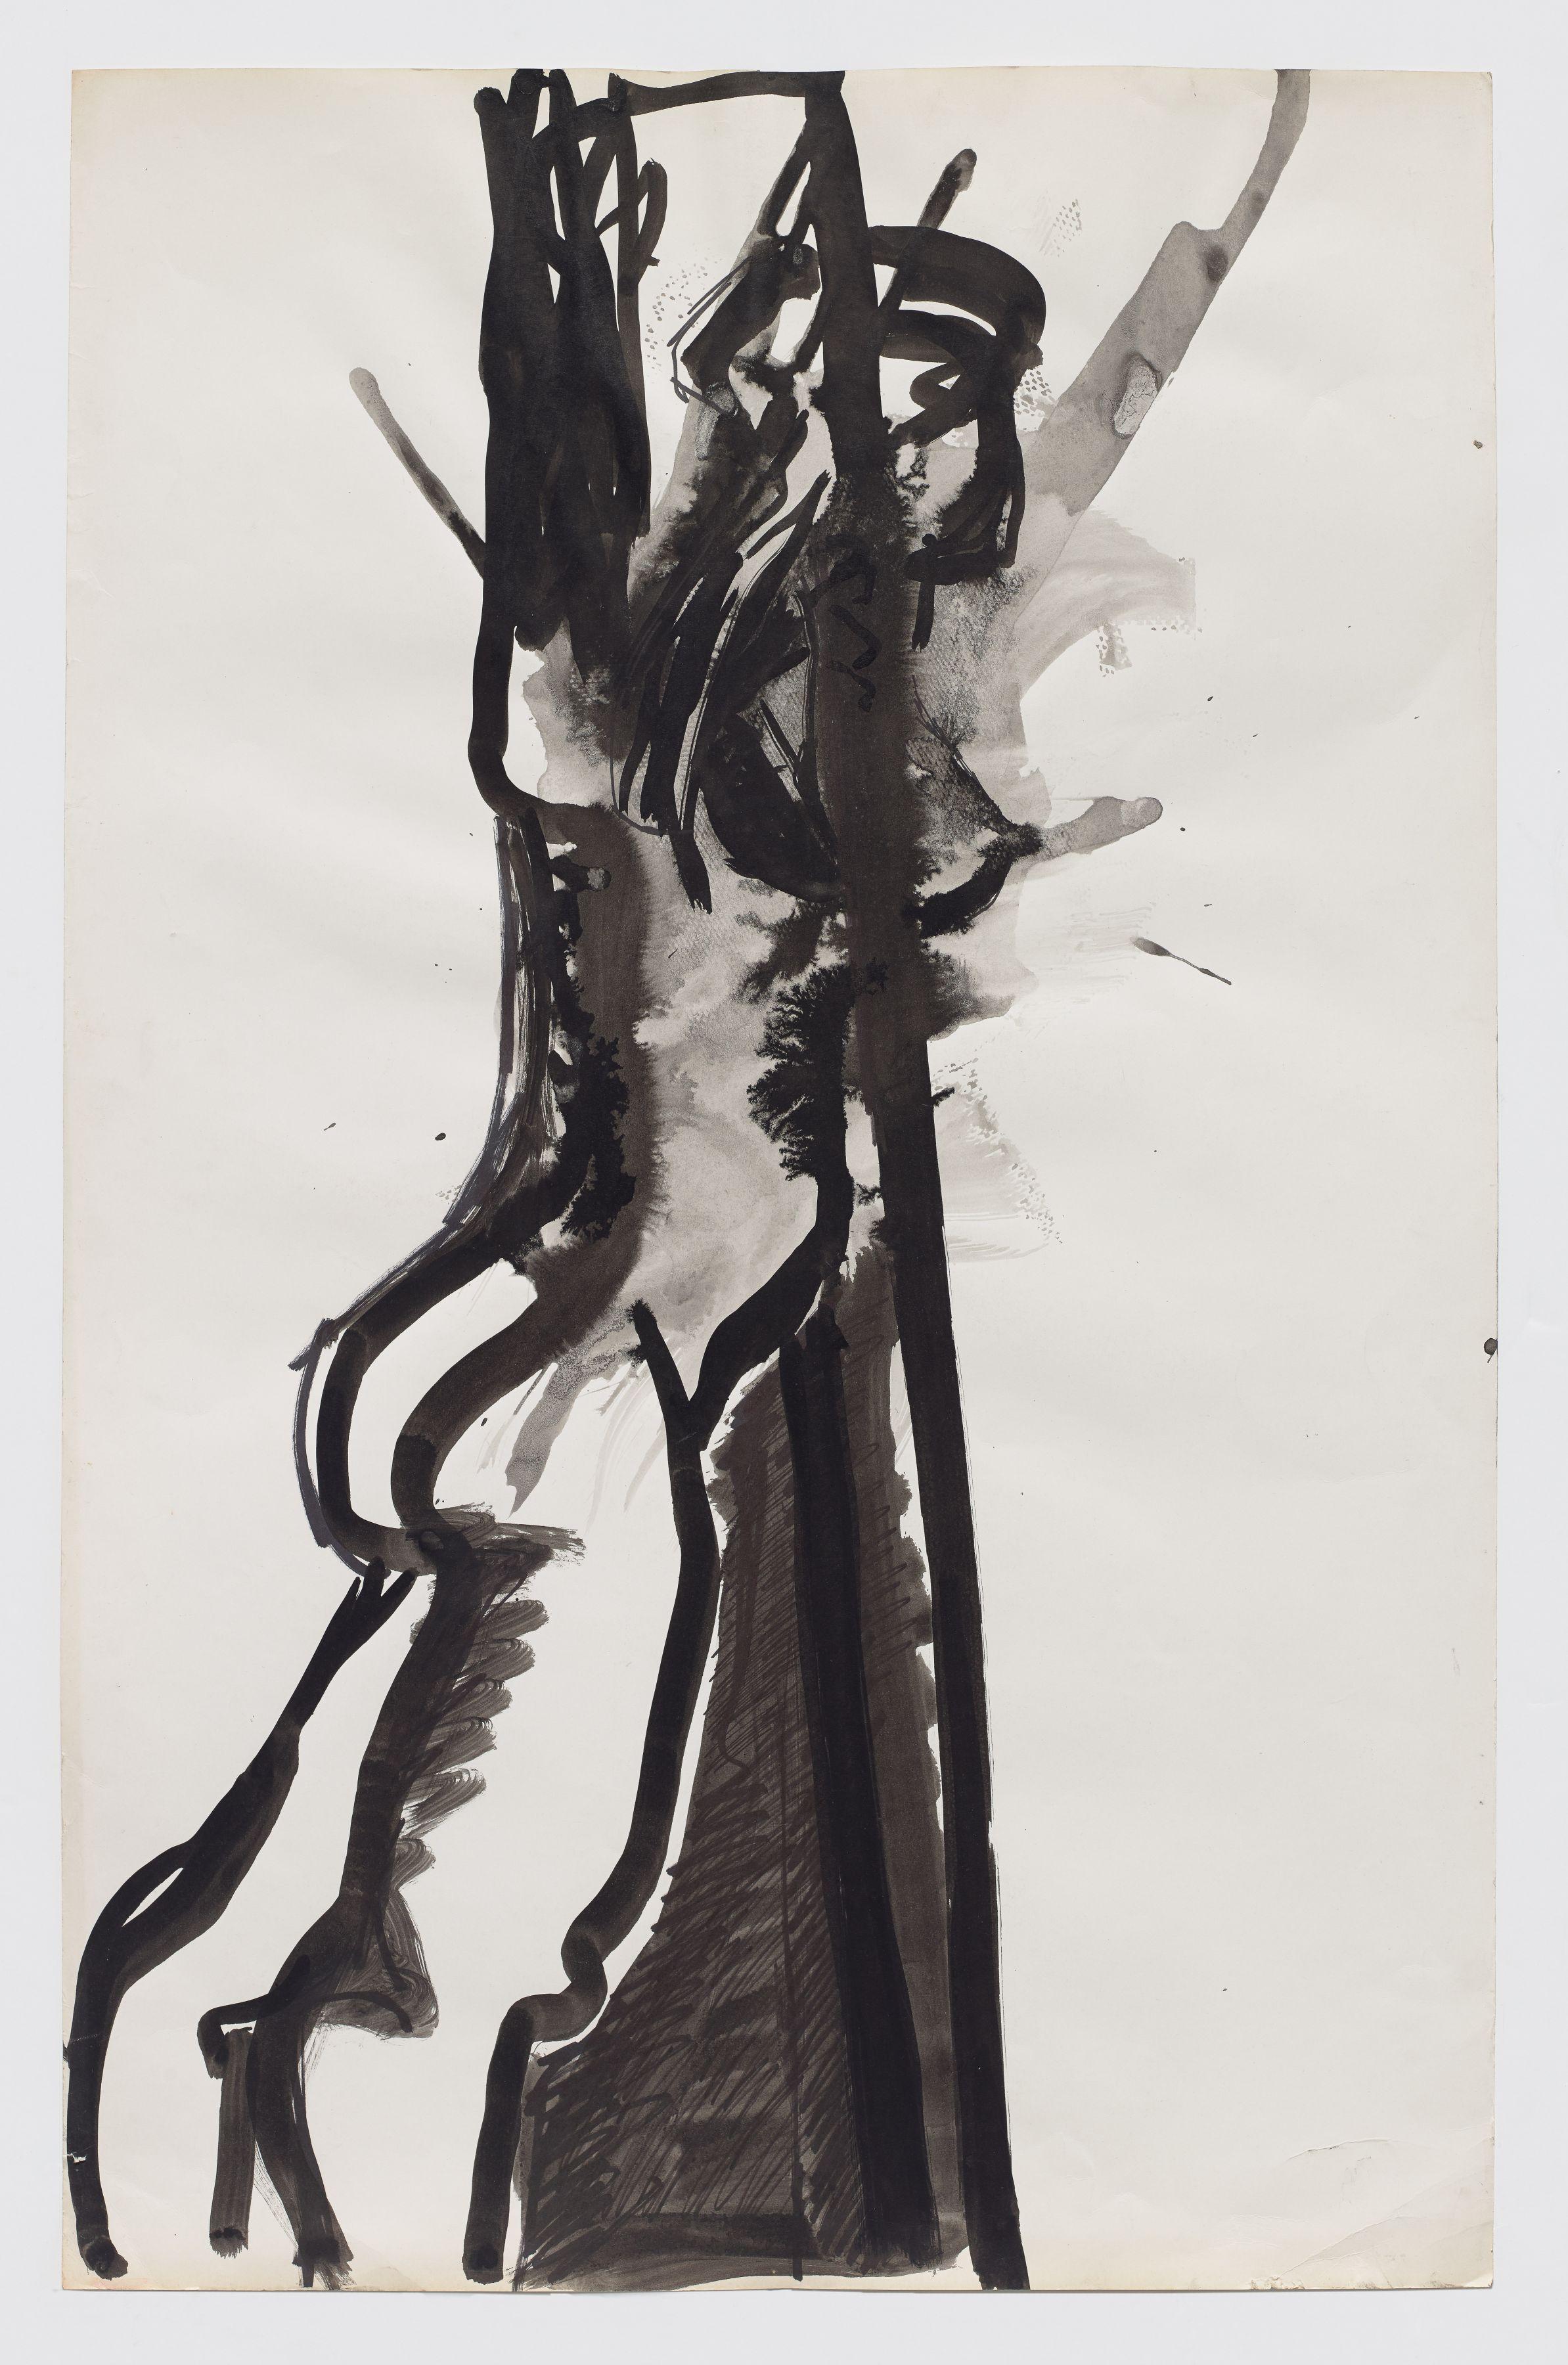 Joan Semmel, Untitled (figure study), c. 1971